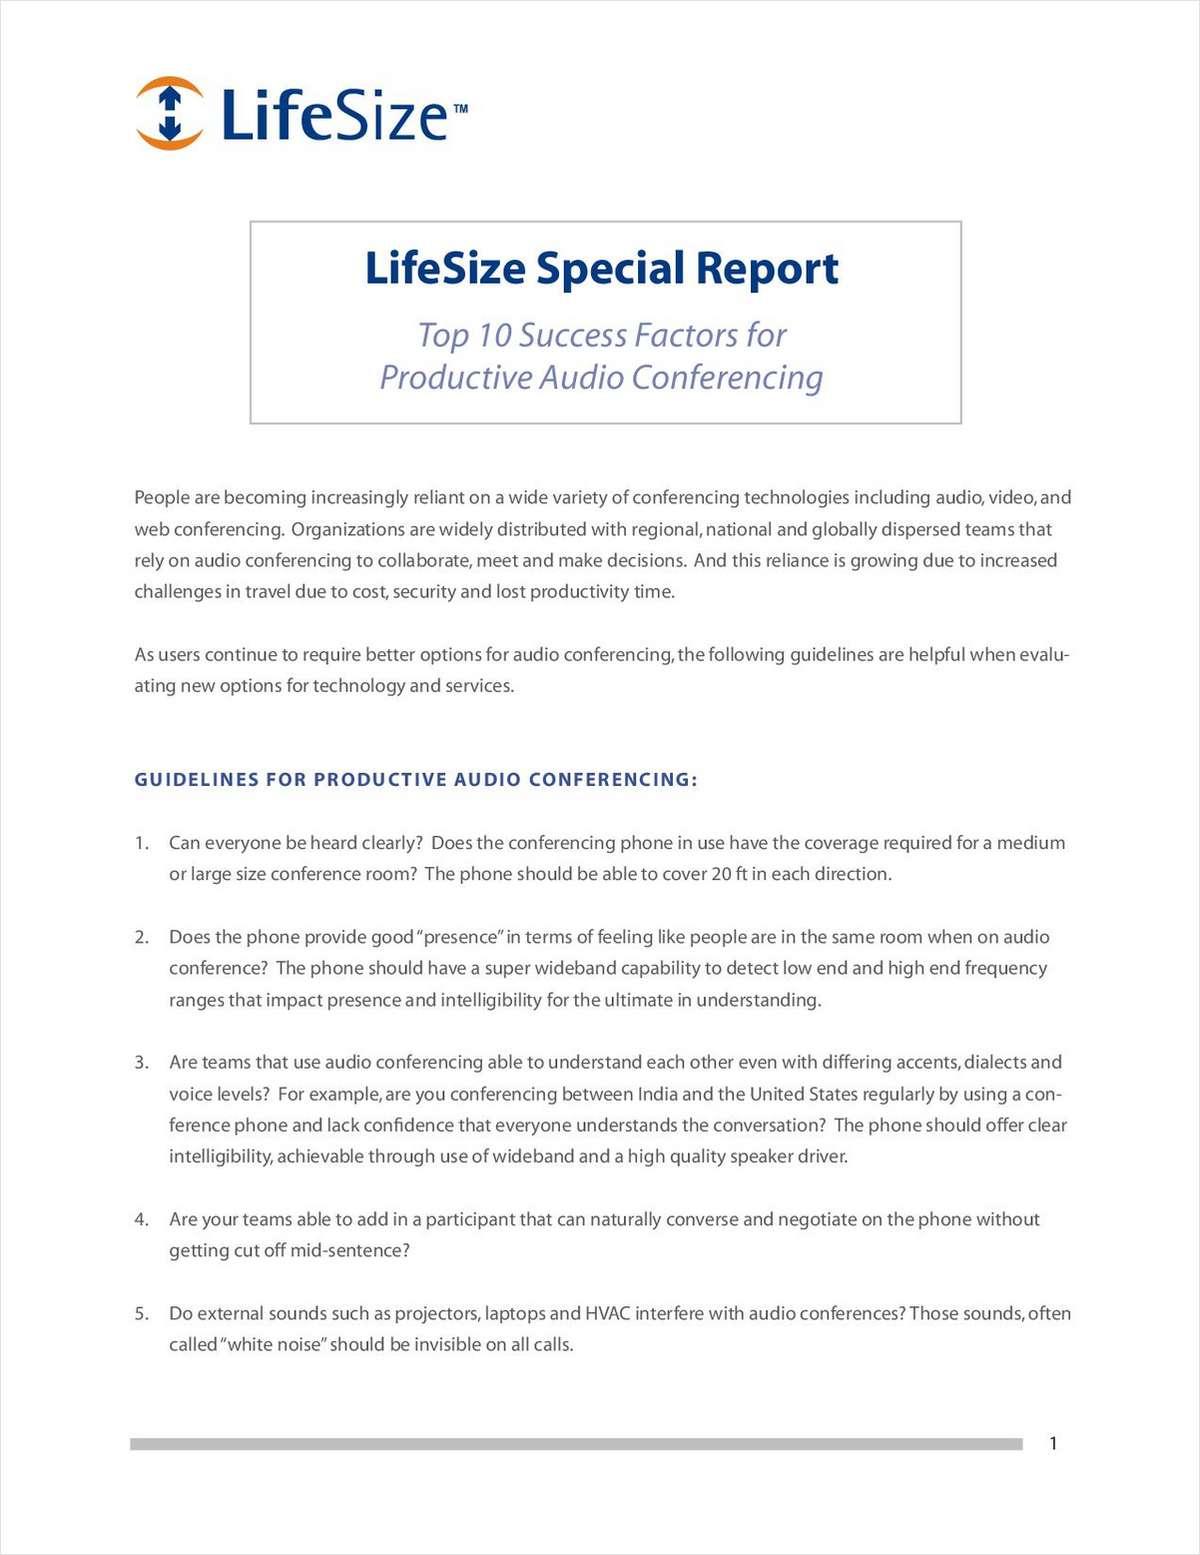 Top 10 Success Factors for Productive Audio Conferencing